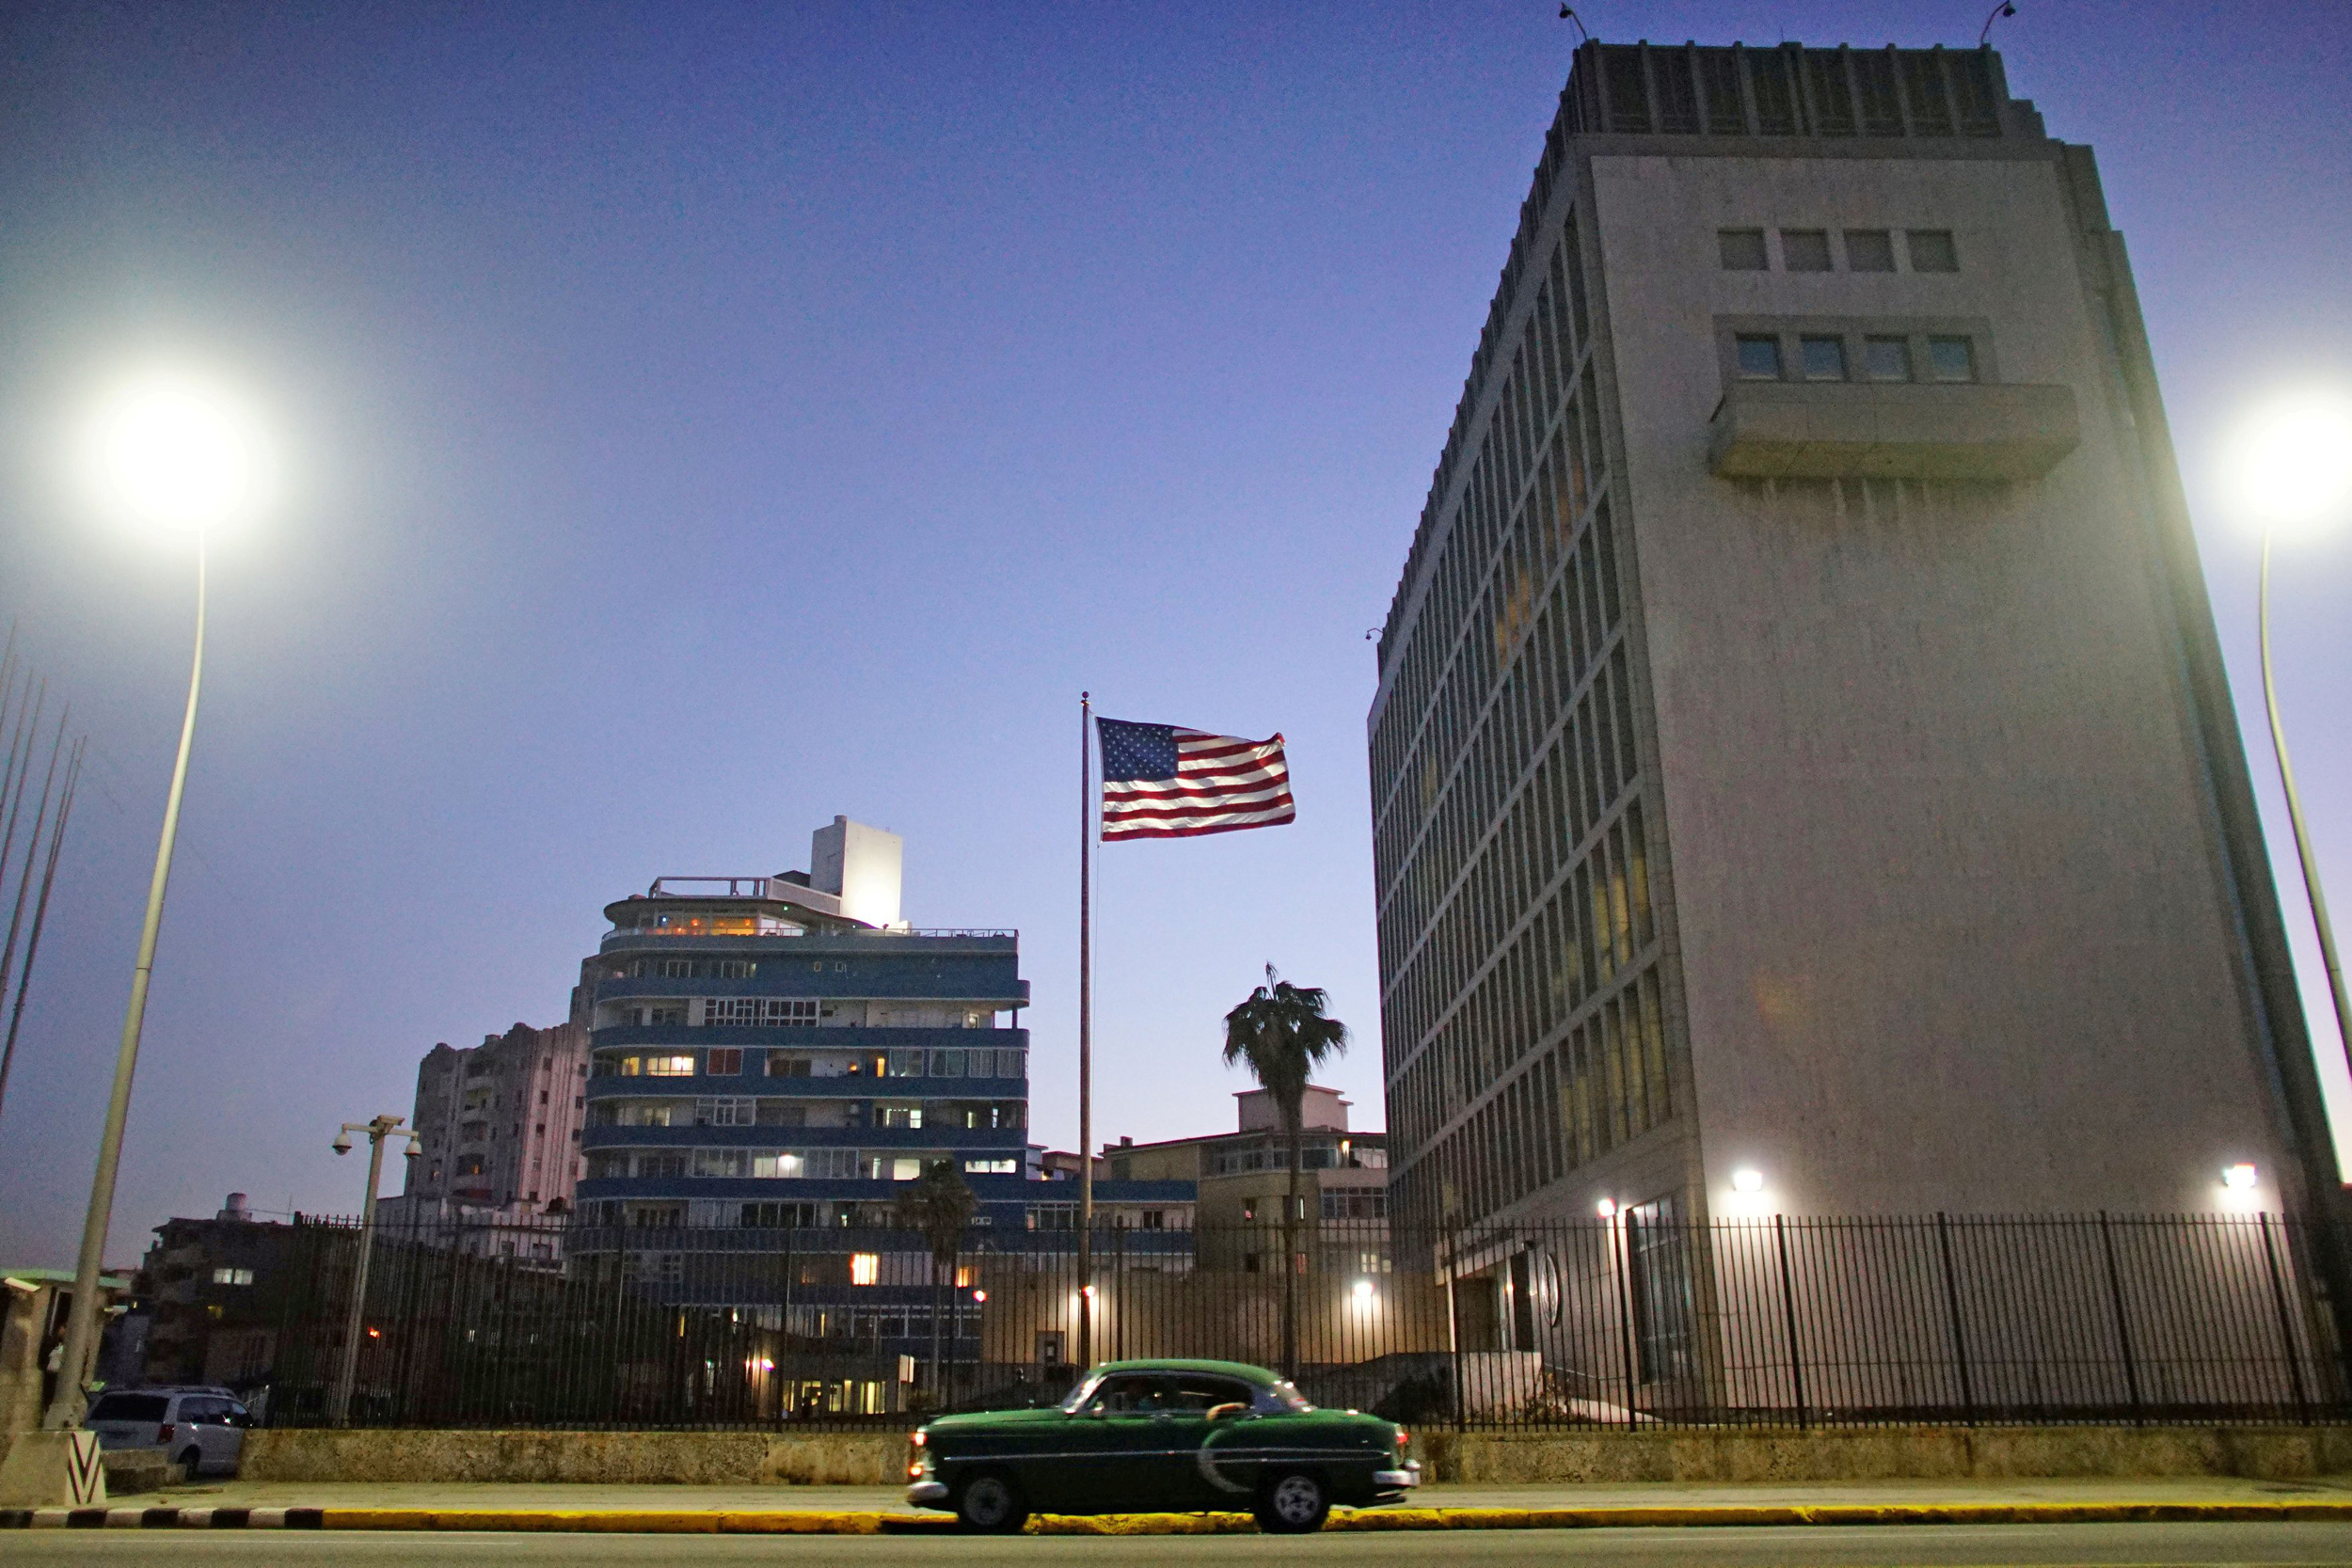 In tense Blinken meeting, 'Havana Syndrome' diplomats complain of skepticism